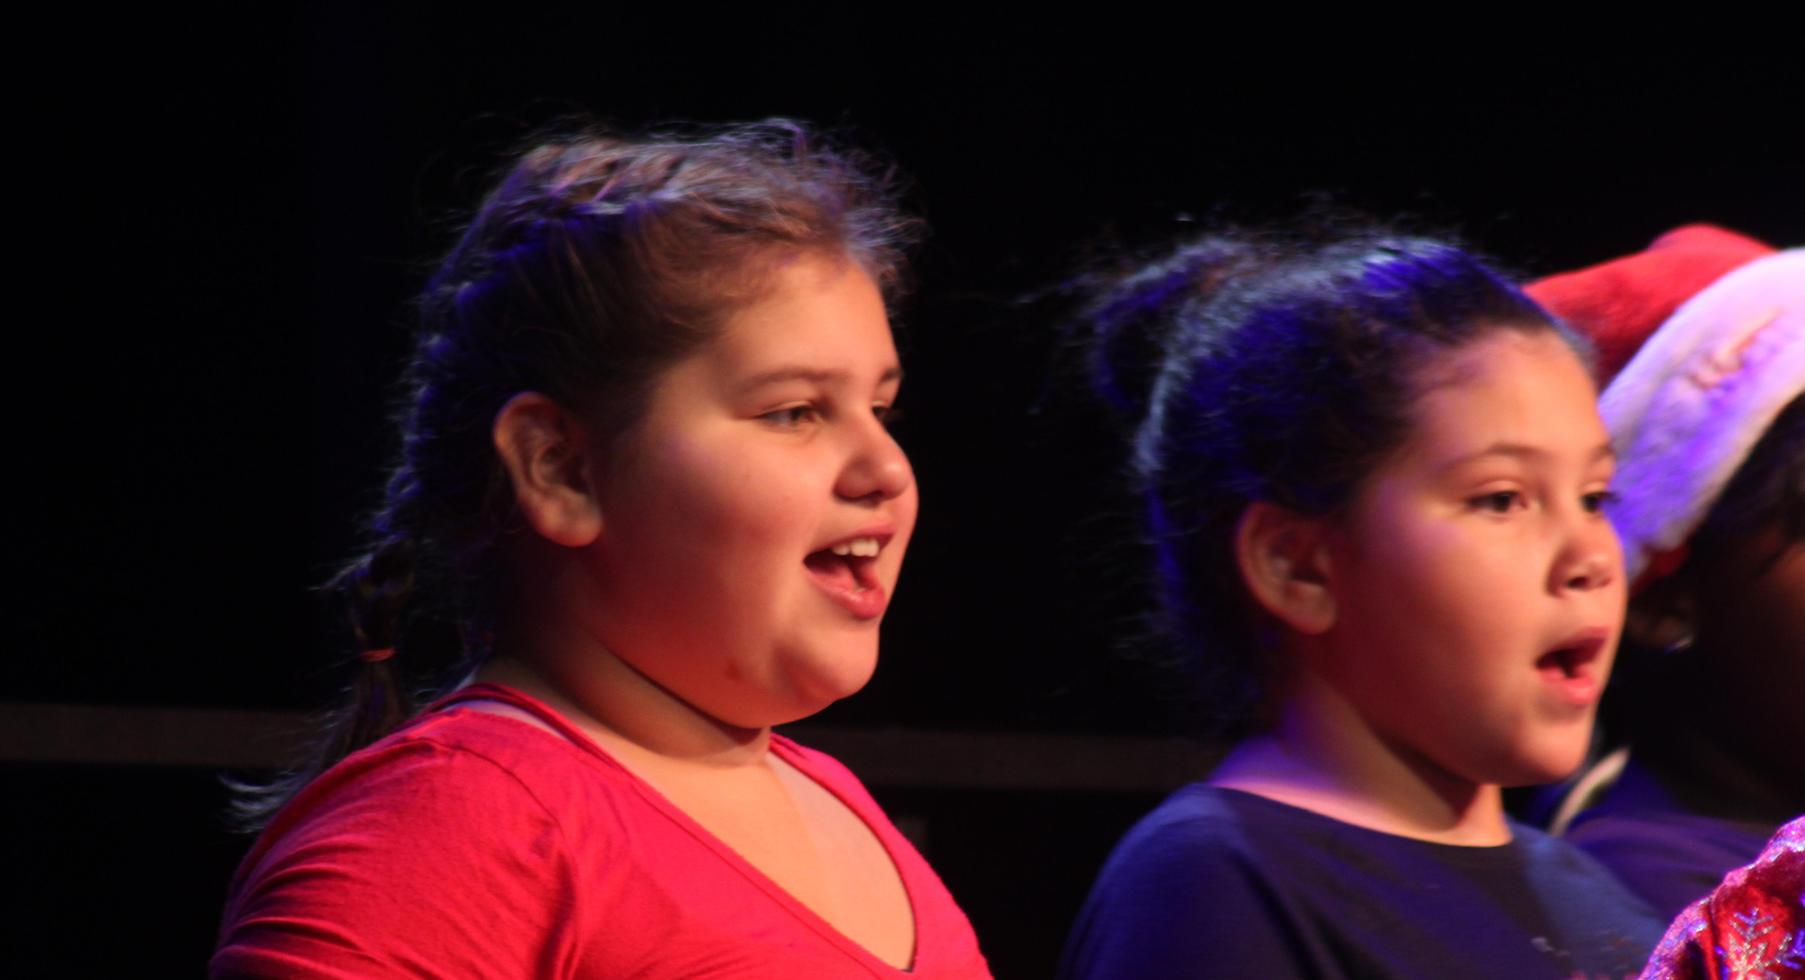 Singing in the Christmas Program